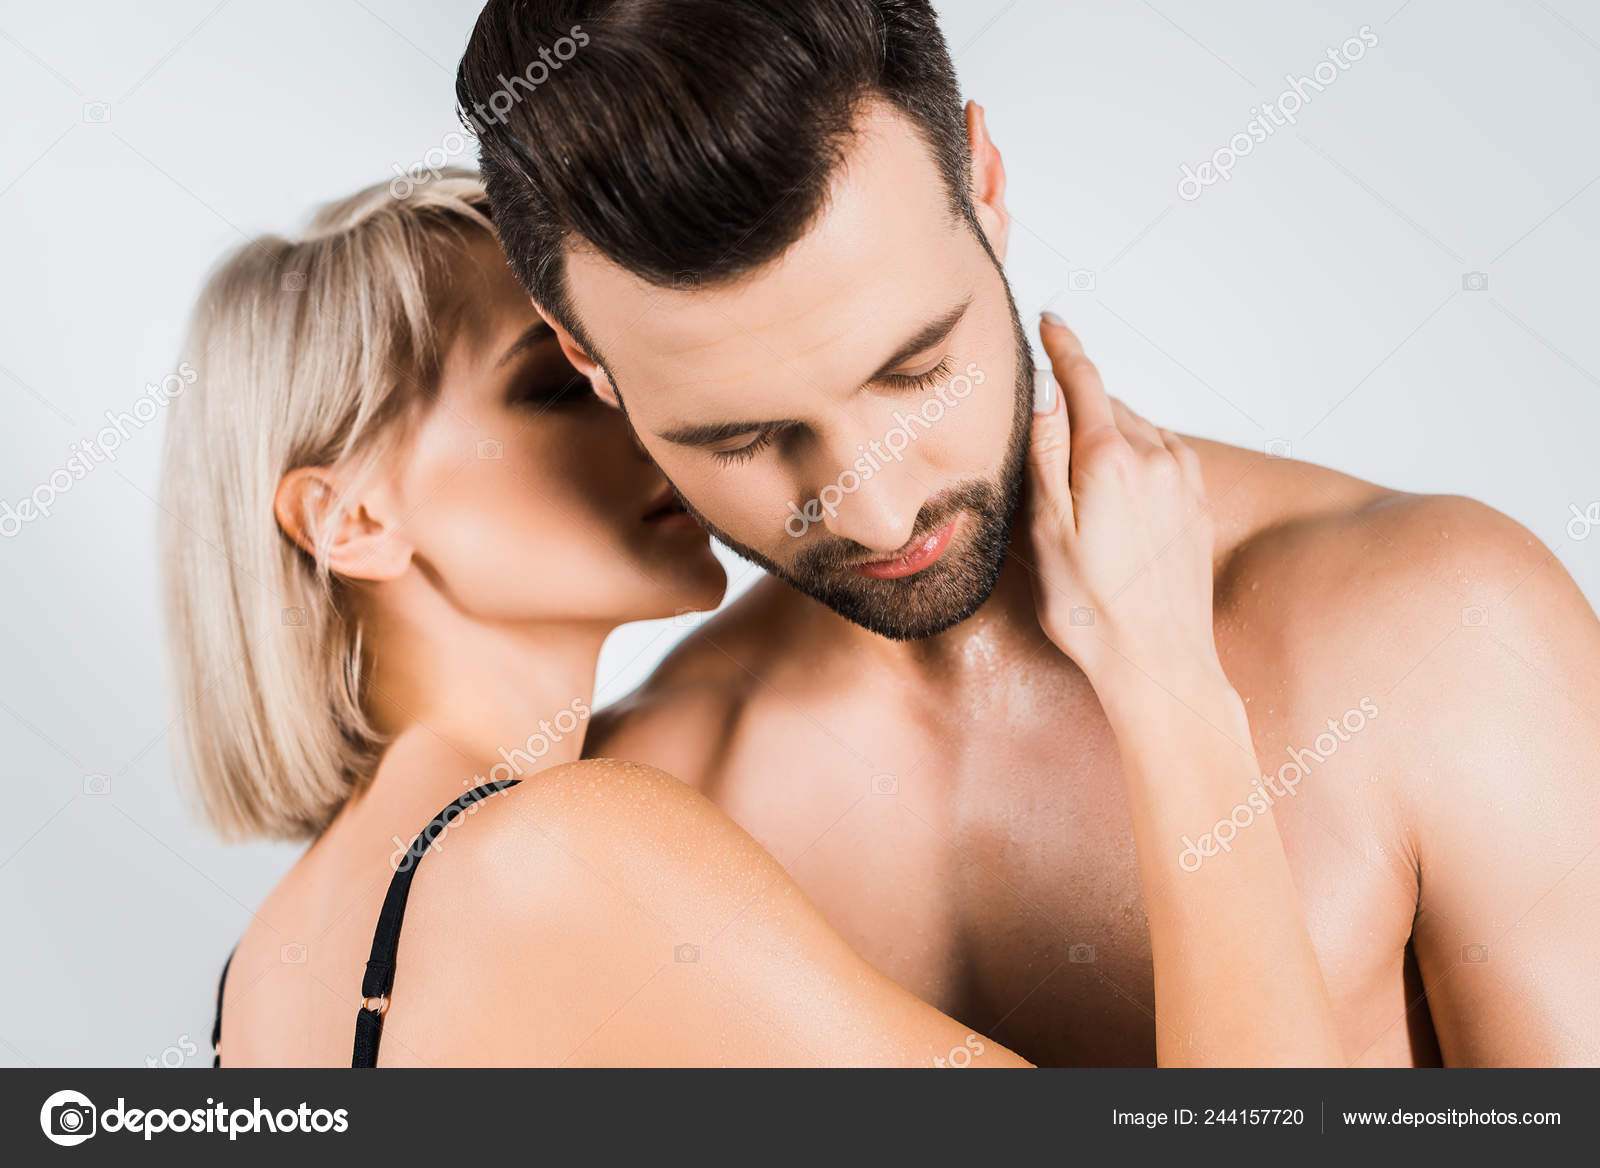 Kisses neck boyfriend my my 12 Kissing